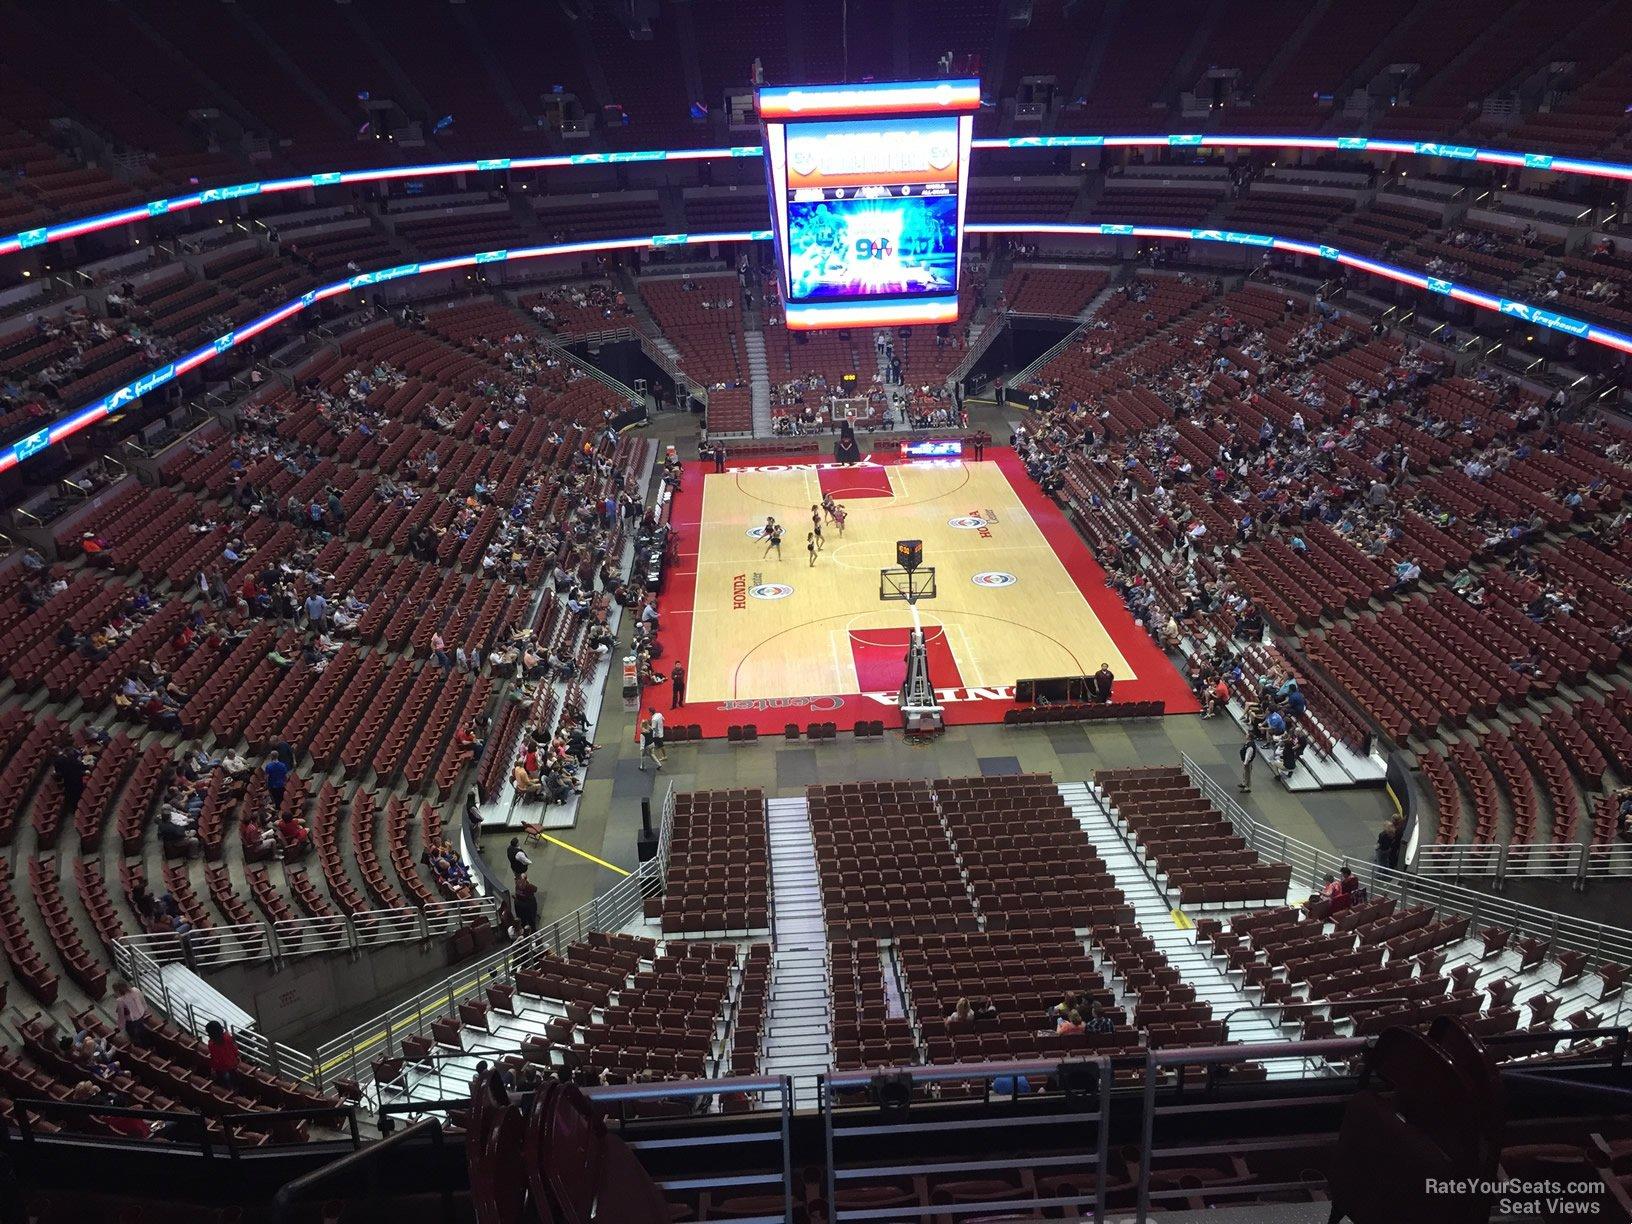 Basketball Seat View For Honda Center Section 401, Row E